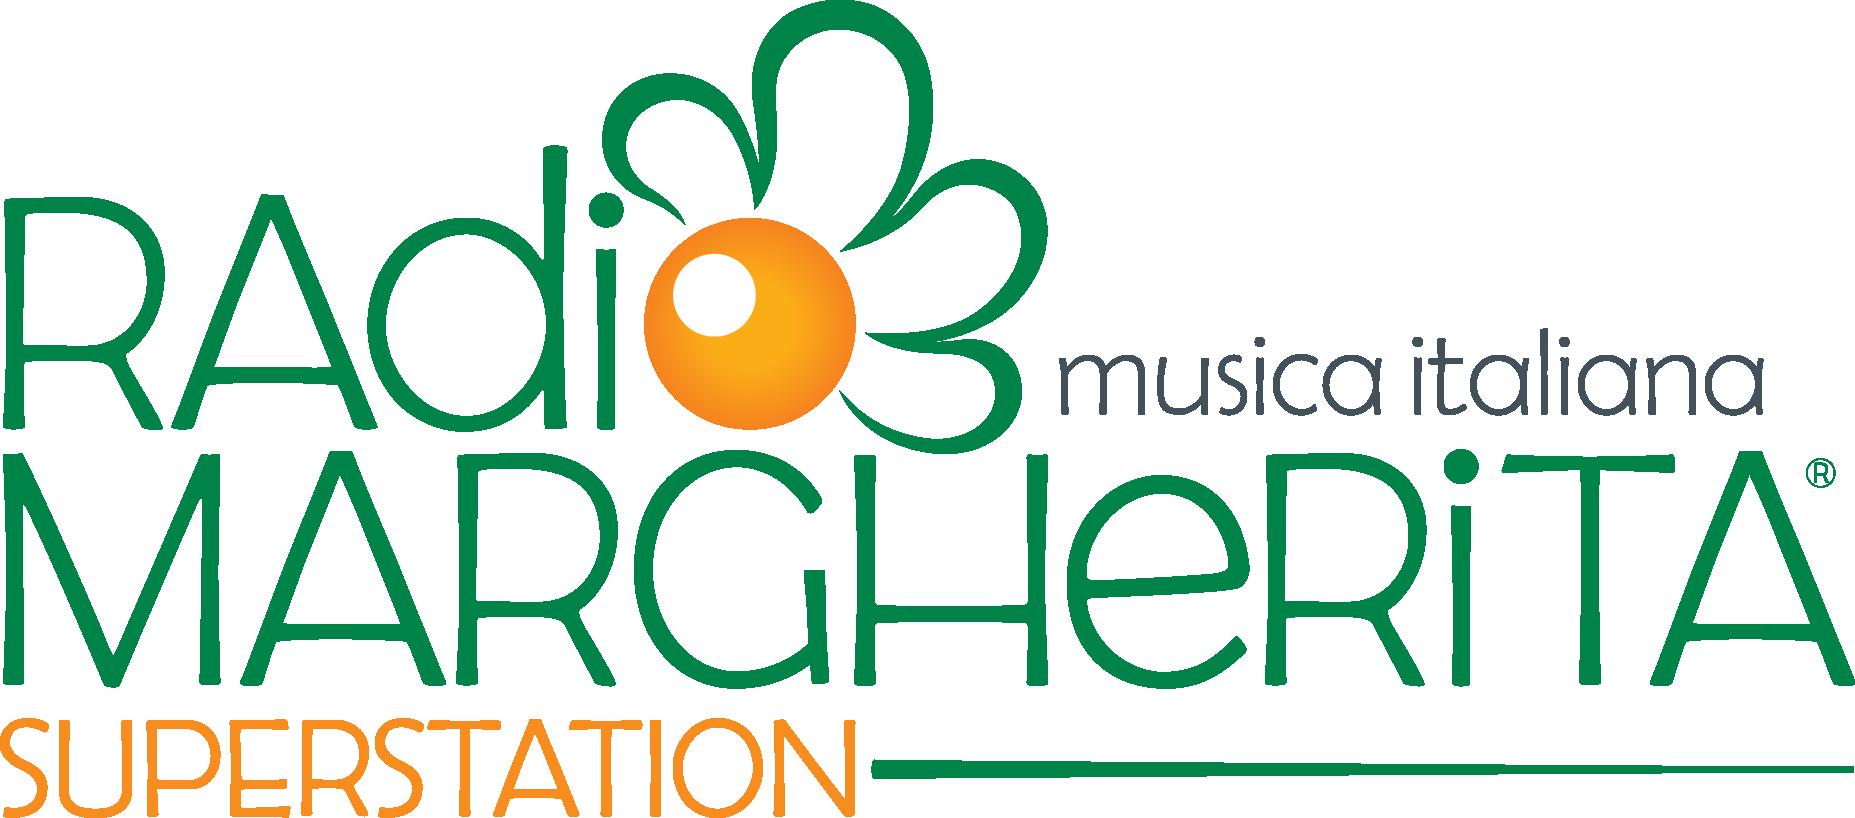 Radio Margherita e Anas